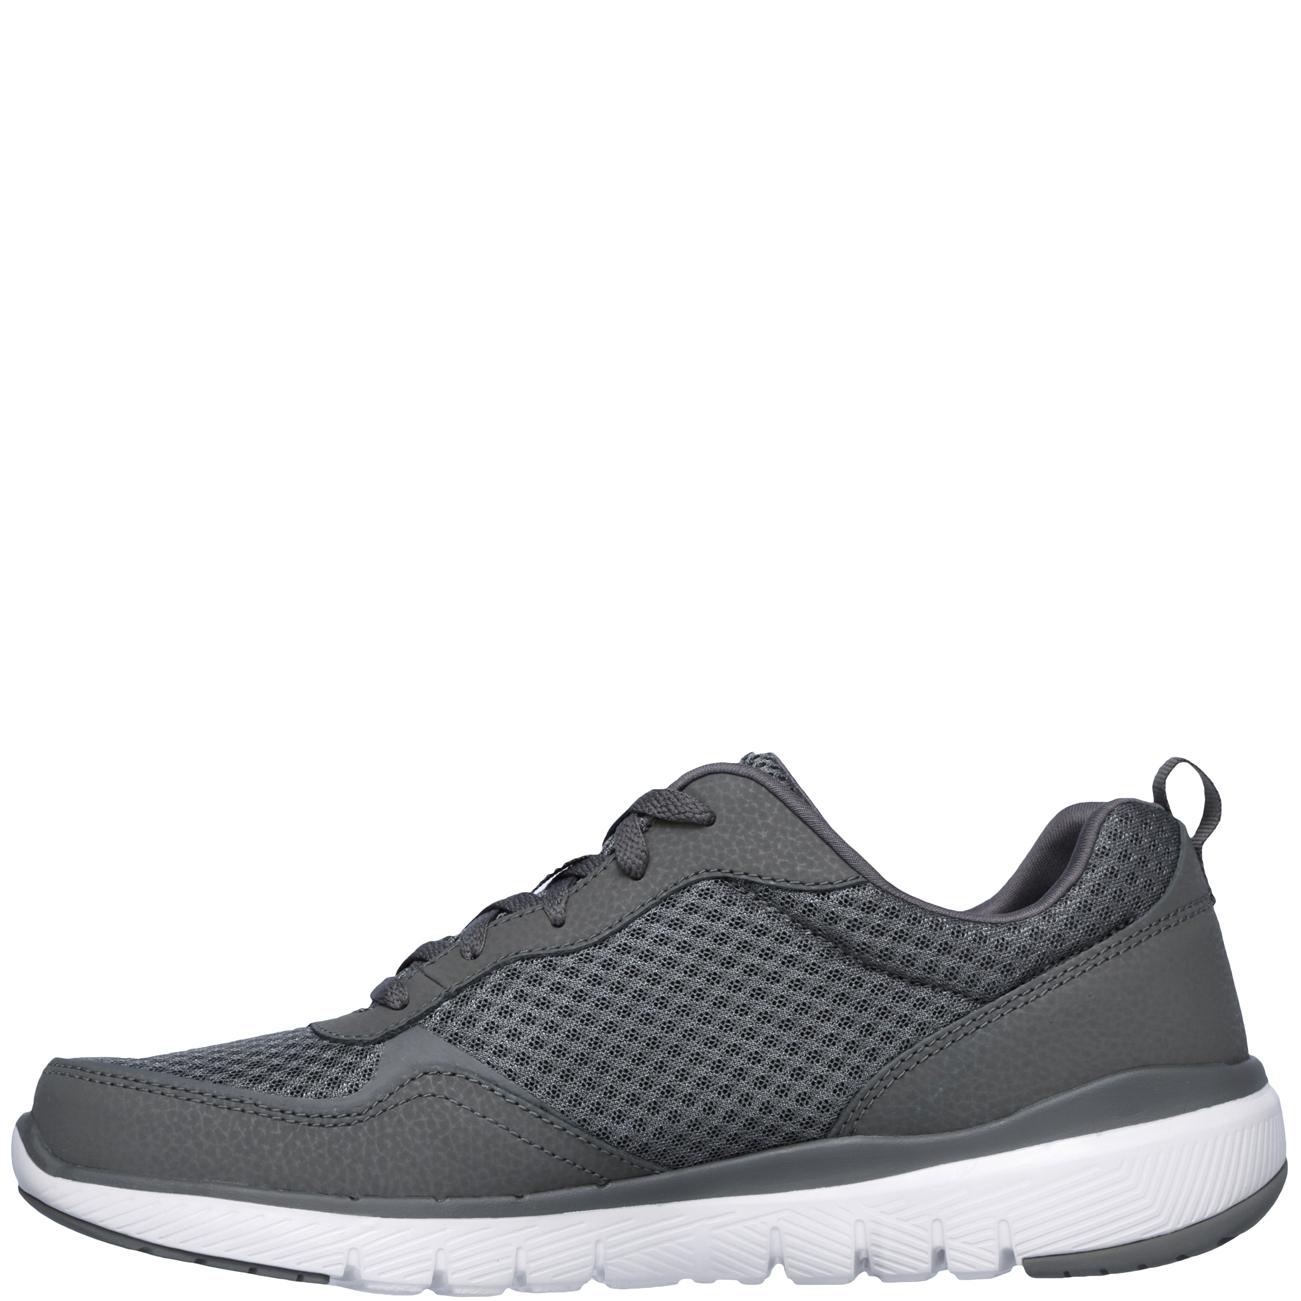 Details about Mens Skechers Flex Advantage 3.0 Walking Gym Lightweight Fitness Sneaker US 8 14